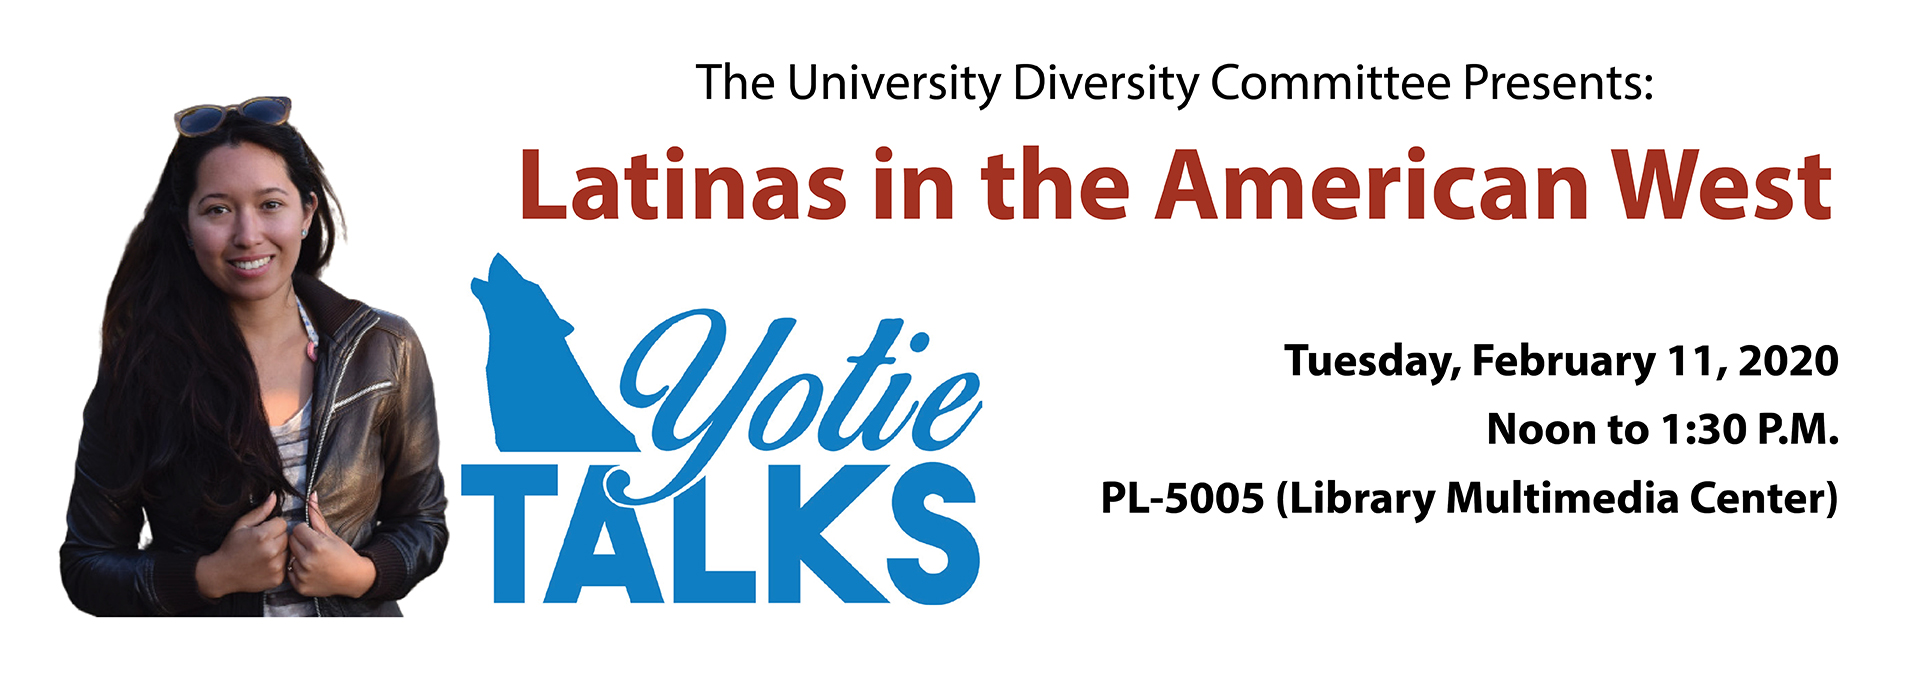 CSUSB professor to explore 19th century poetry by Latinas at Yotie Talk event